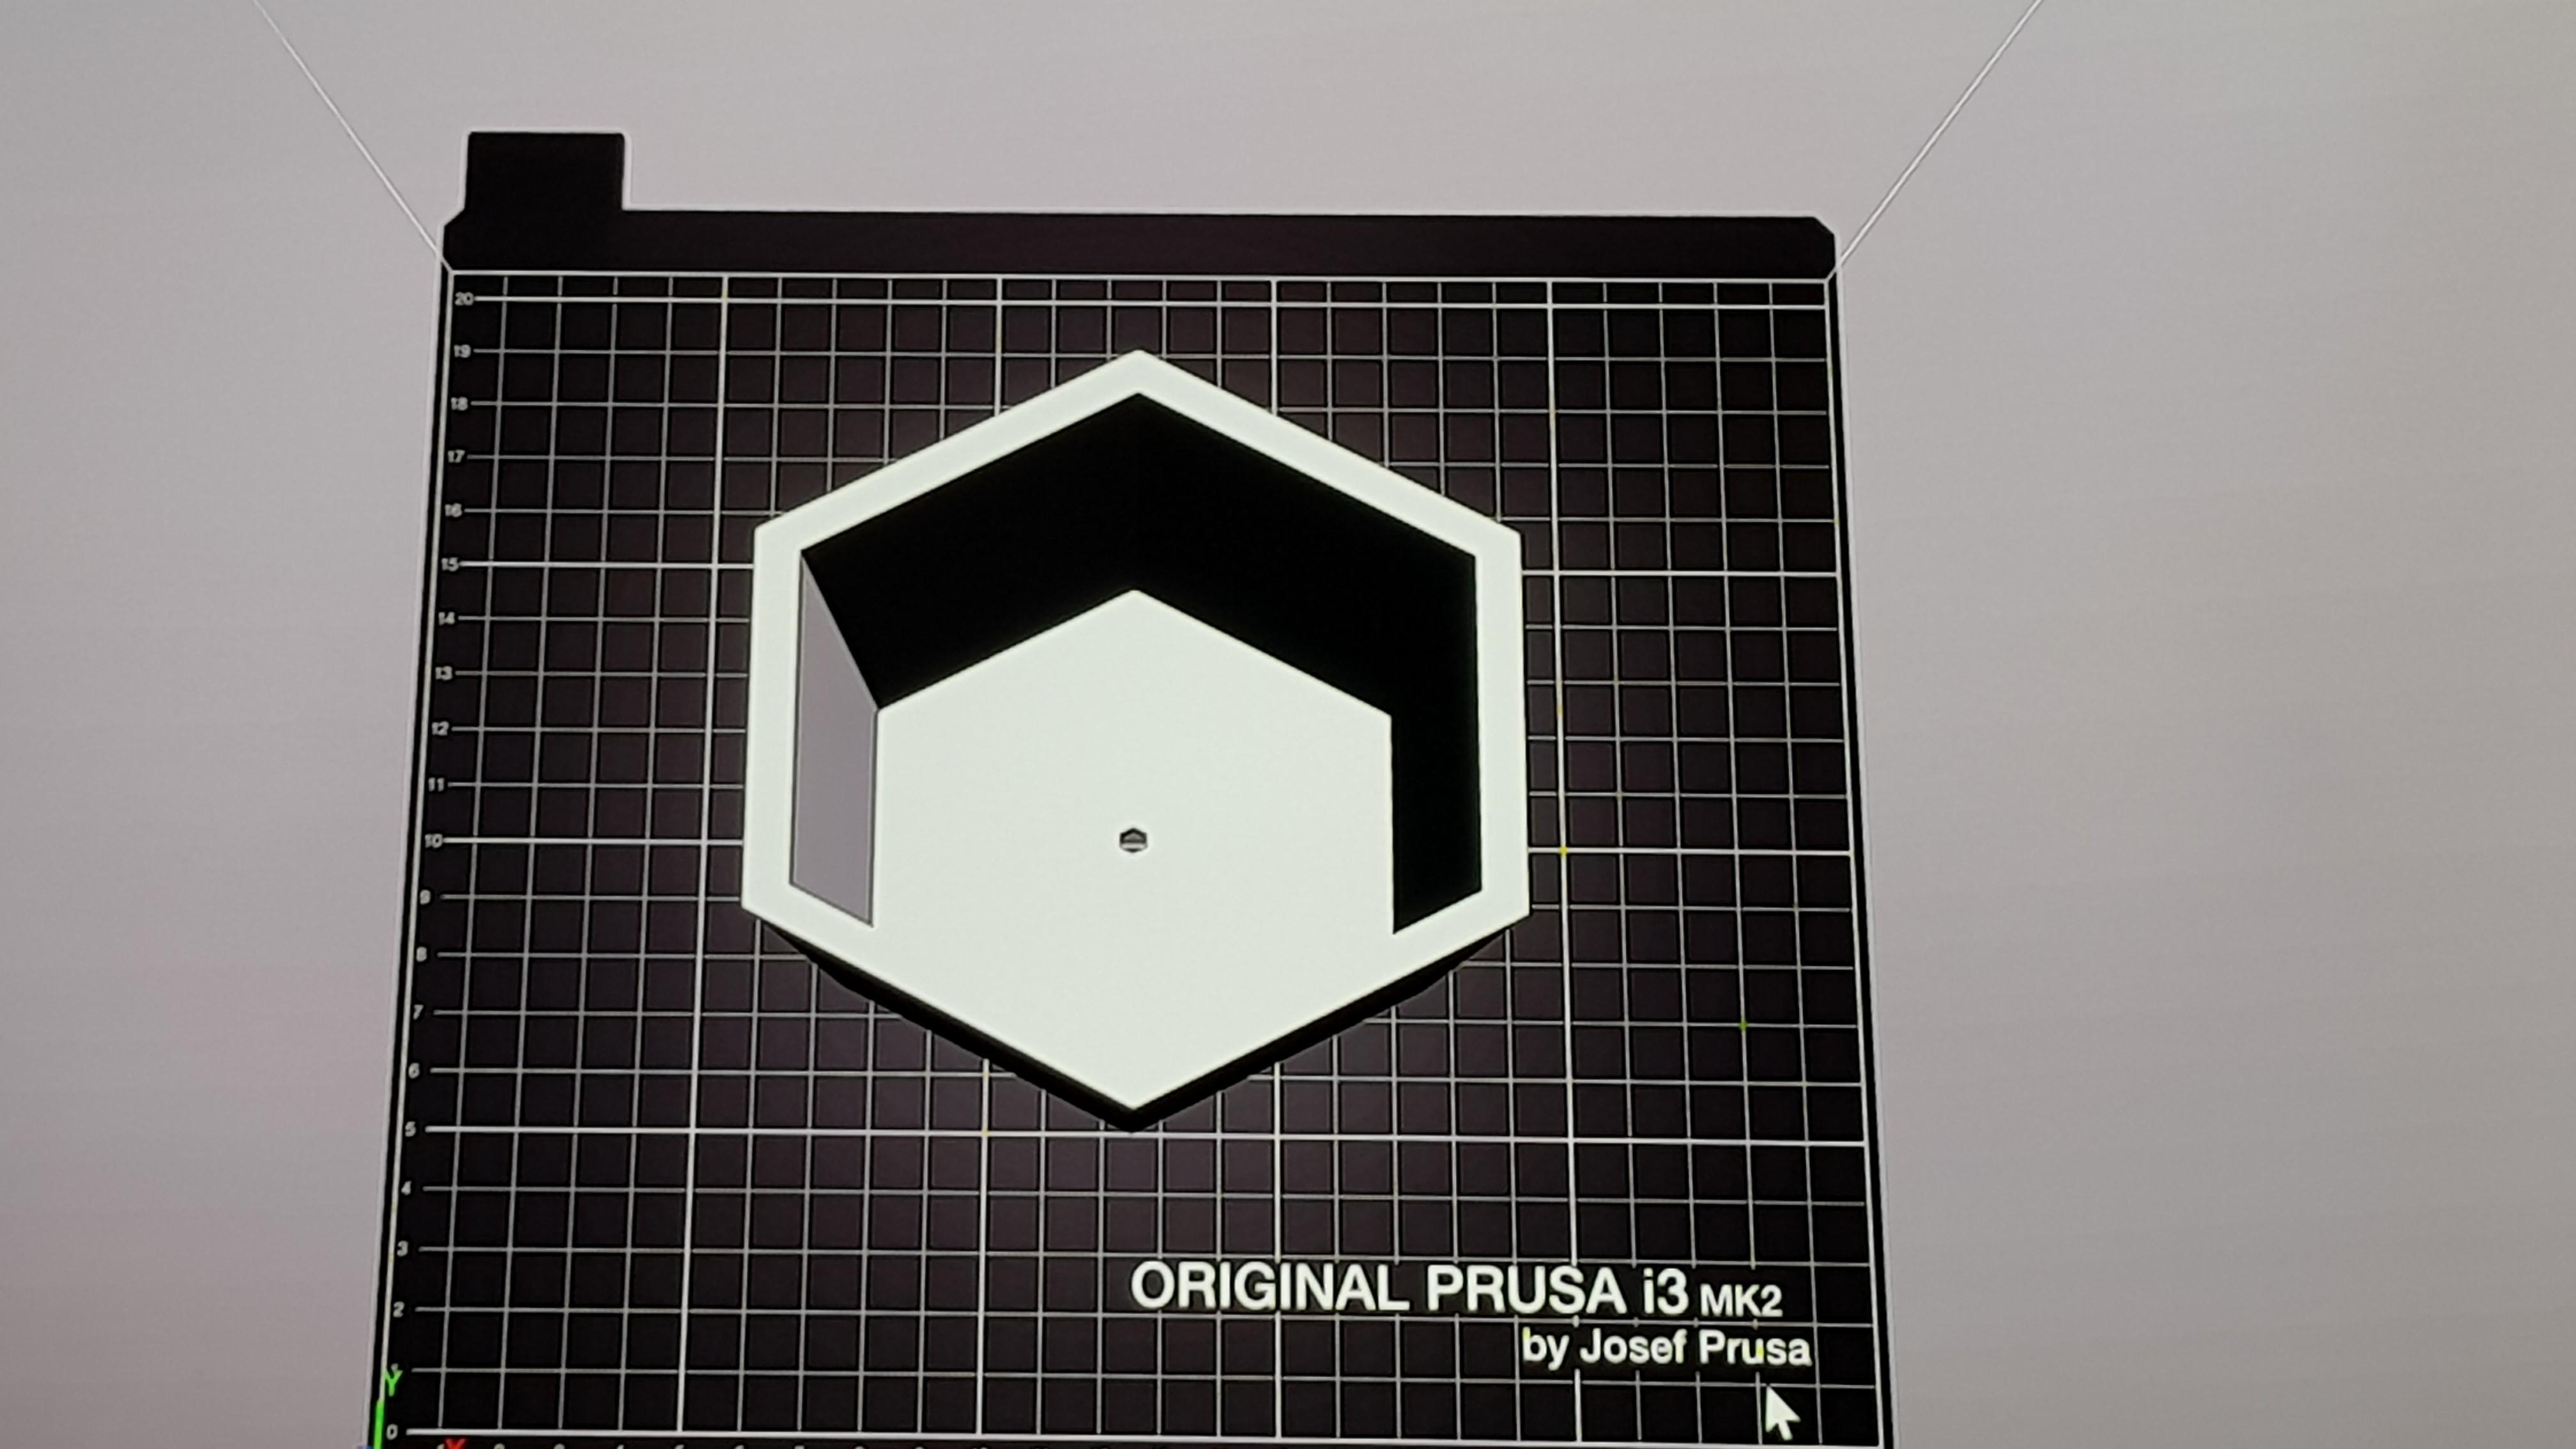 20180208_193504.jpg Download free STL file Hexagonal planter  • 3D printer model, solunkejagruti